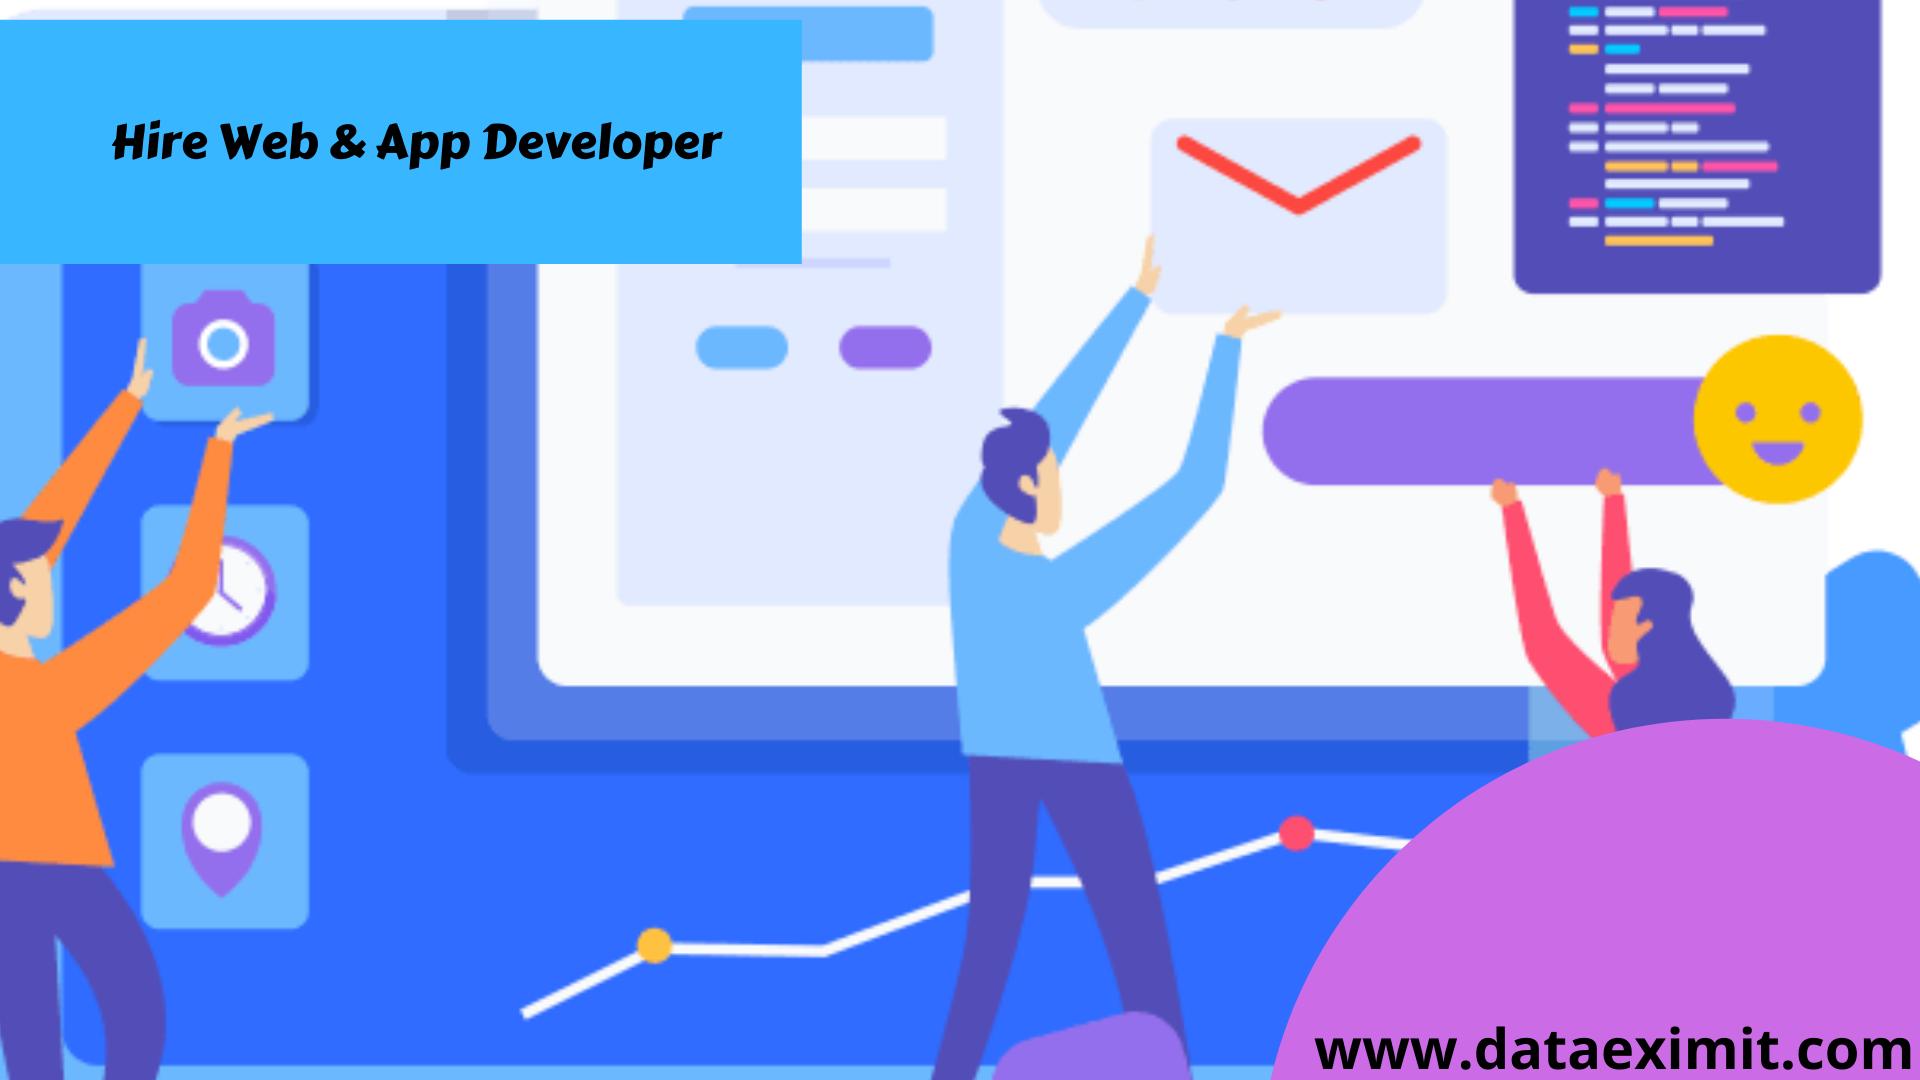 Hire Web & App Developer